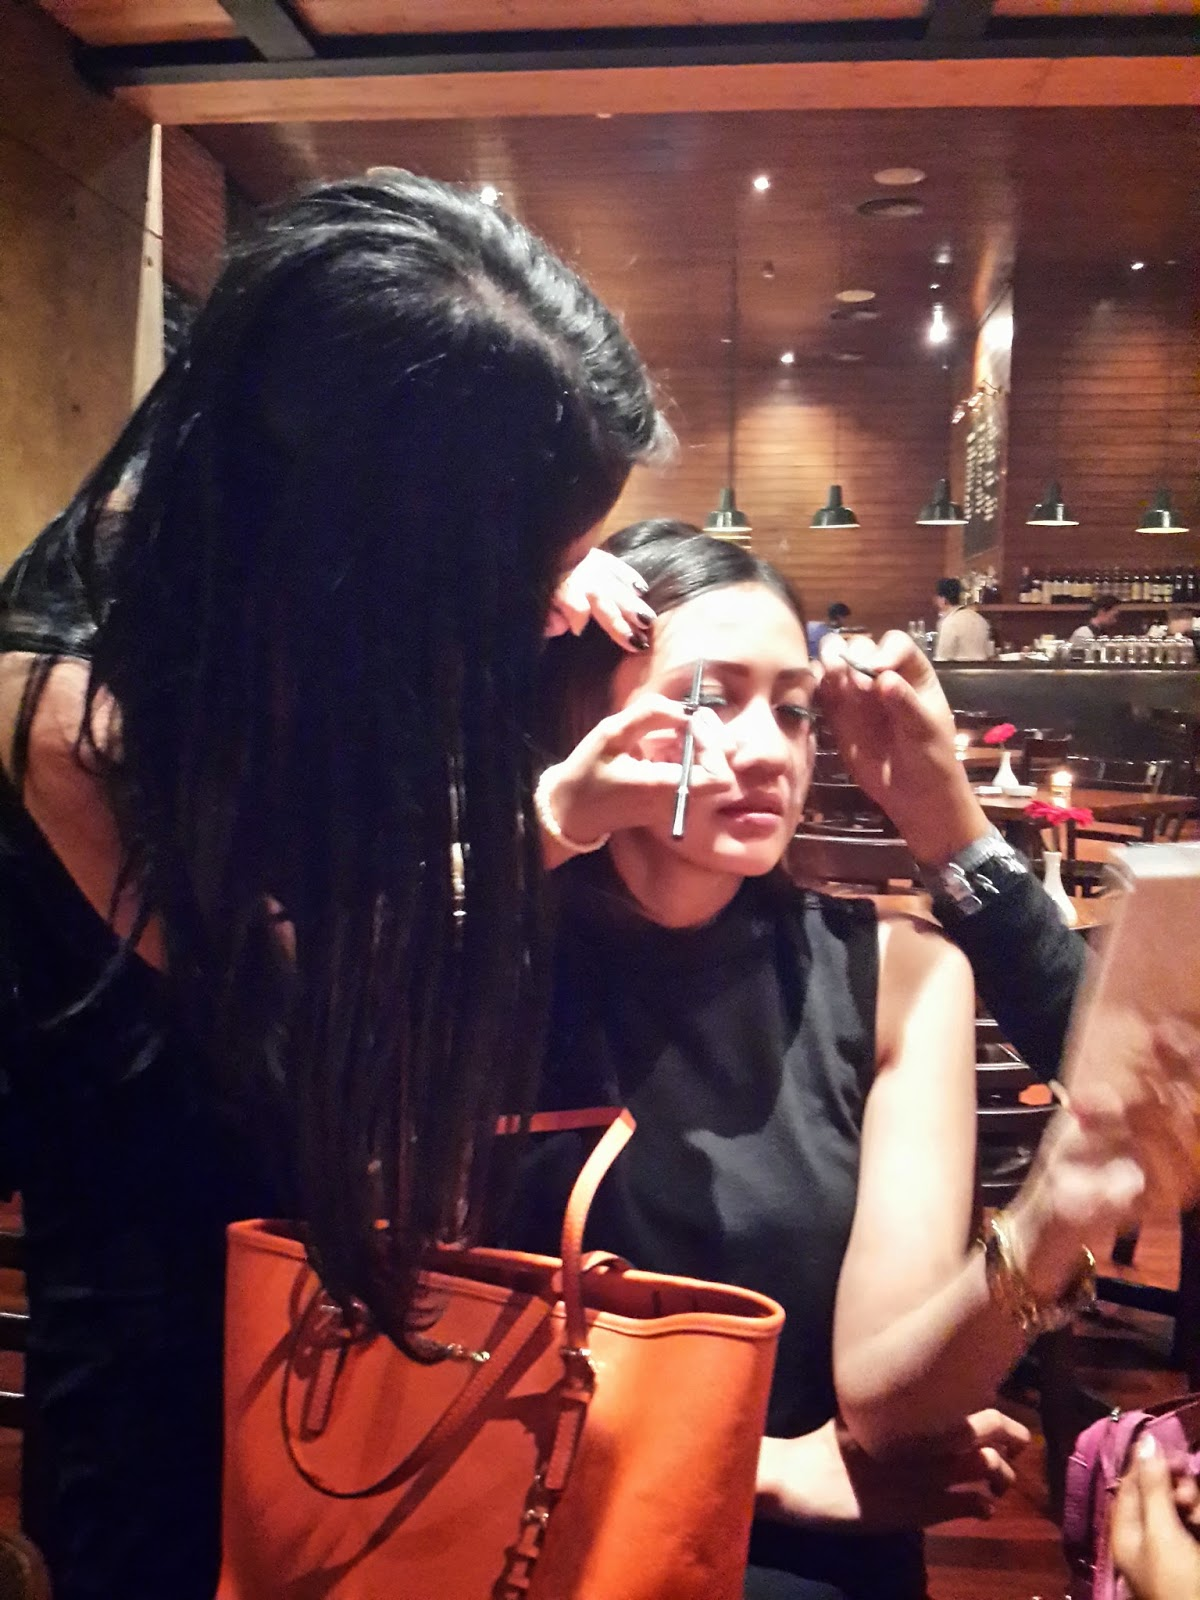 kursus make up artist jakarta barat